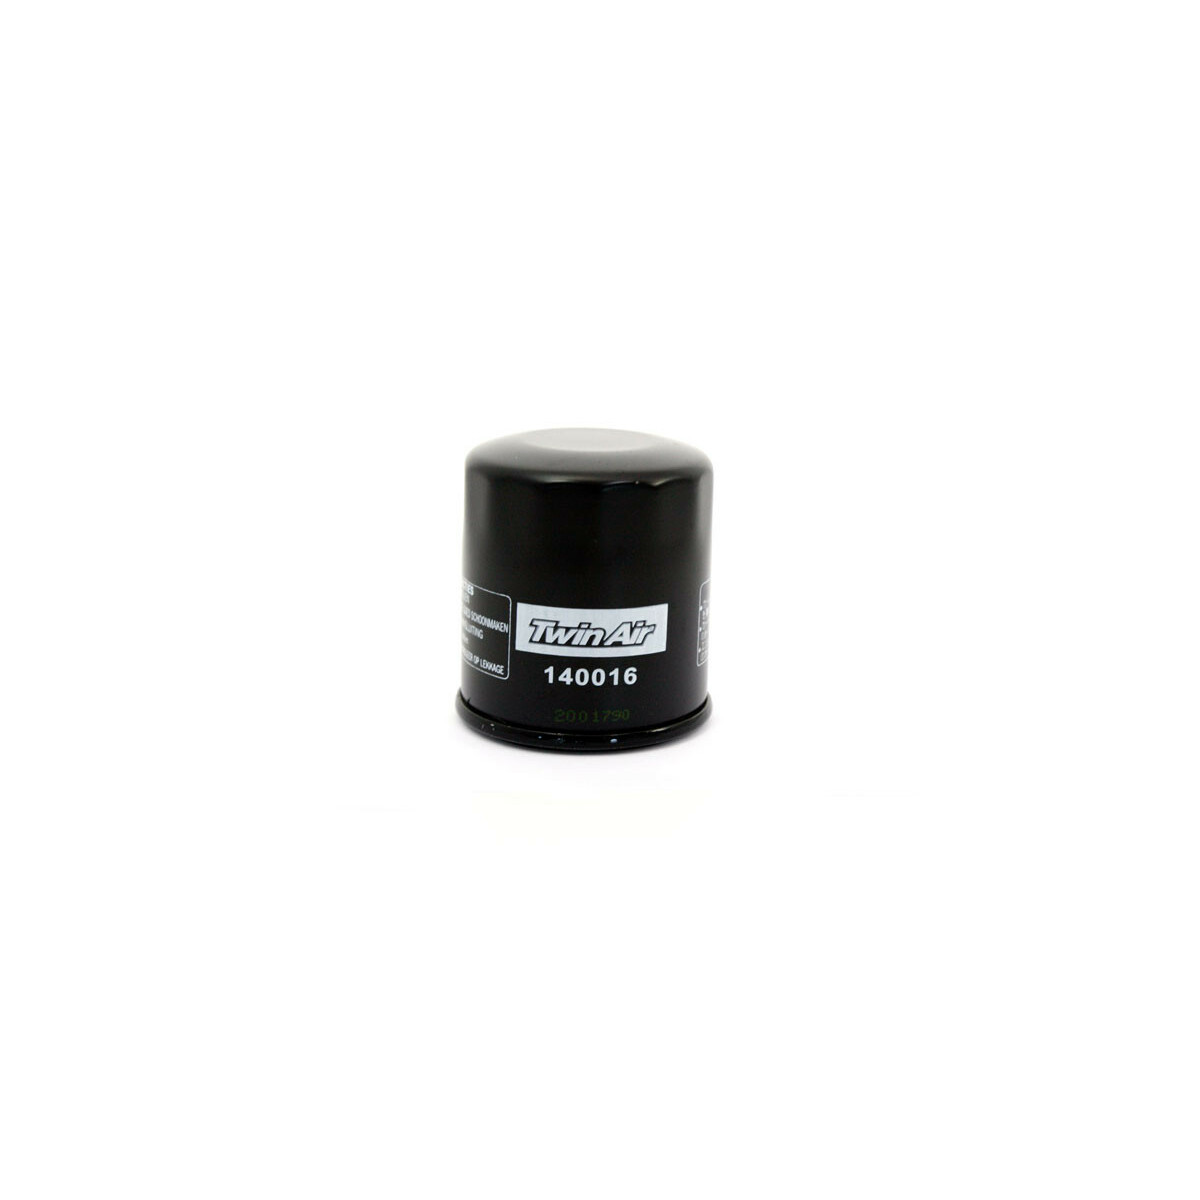 IGNITION COIL SH 100 96-99 .. KR Zündspule HONDA SFX 50 96-98